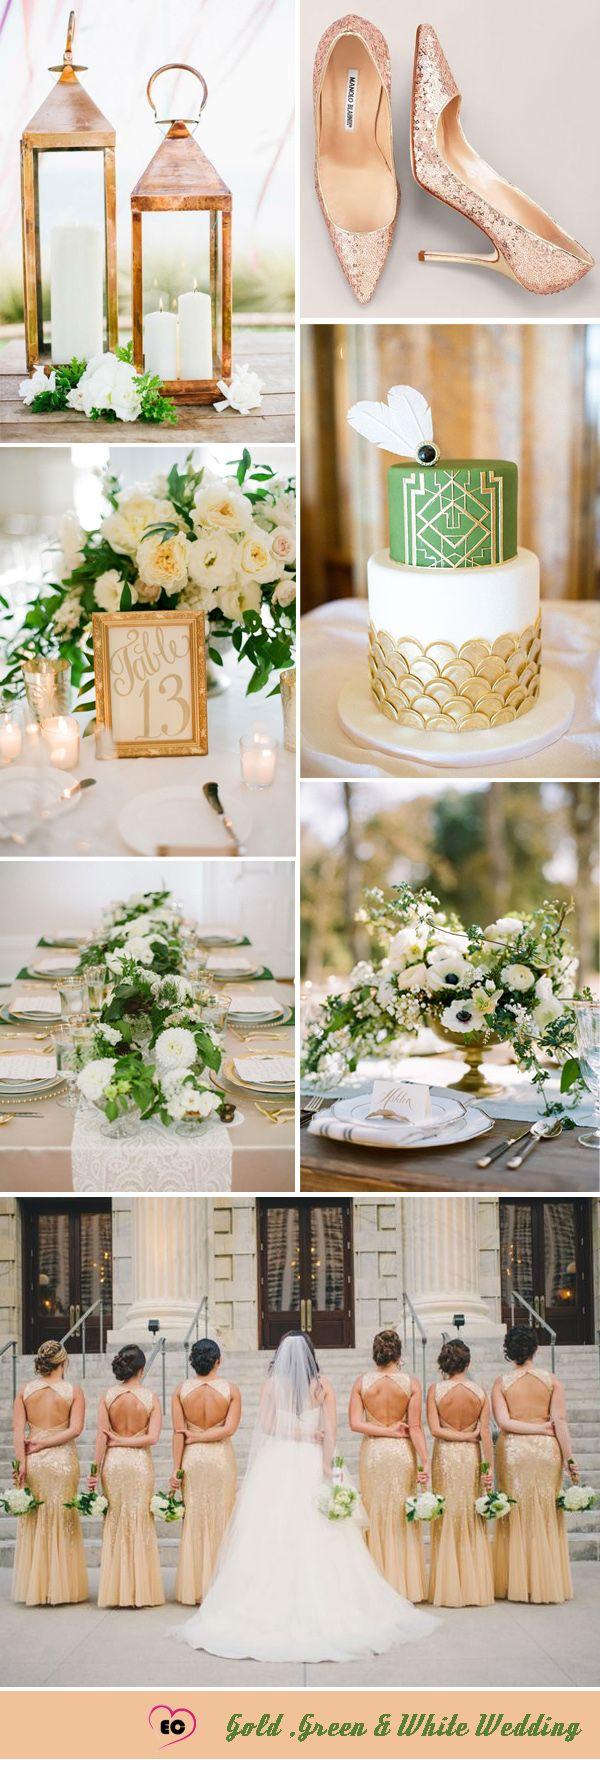 Green and white wedding dress   best Future Wedding images on Pinterest  Wedding ideas Girls